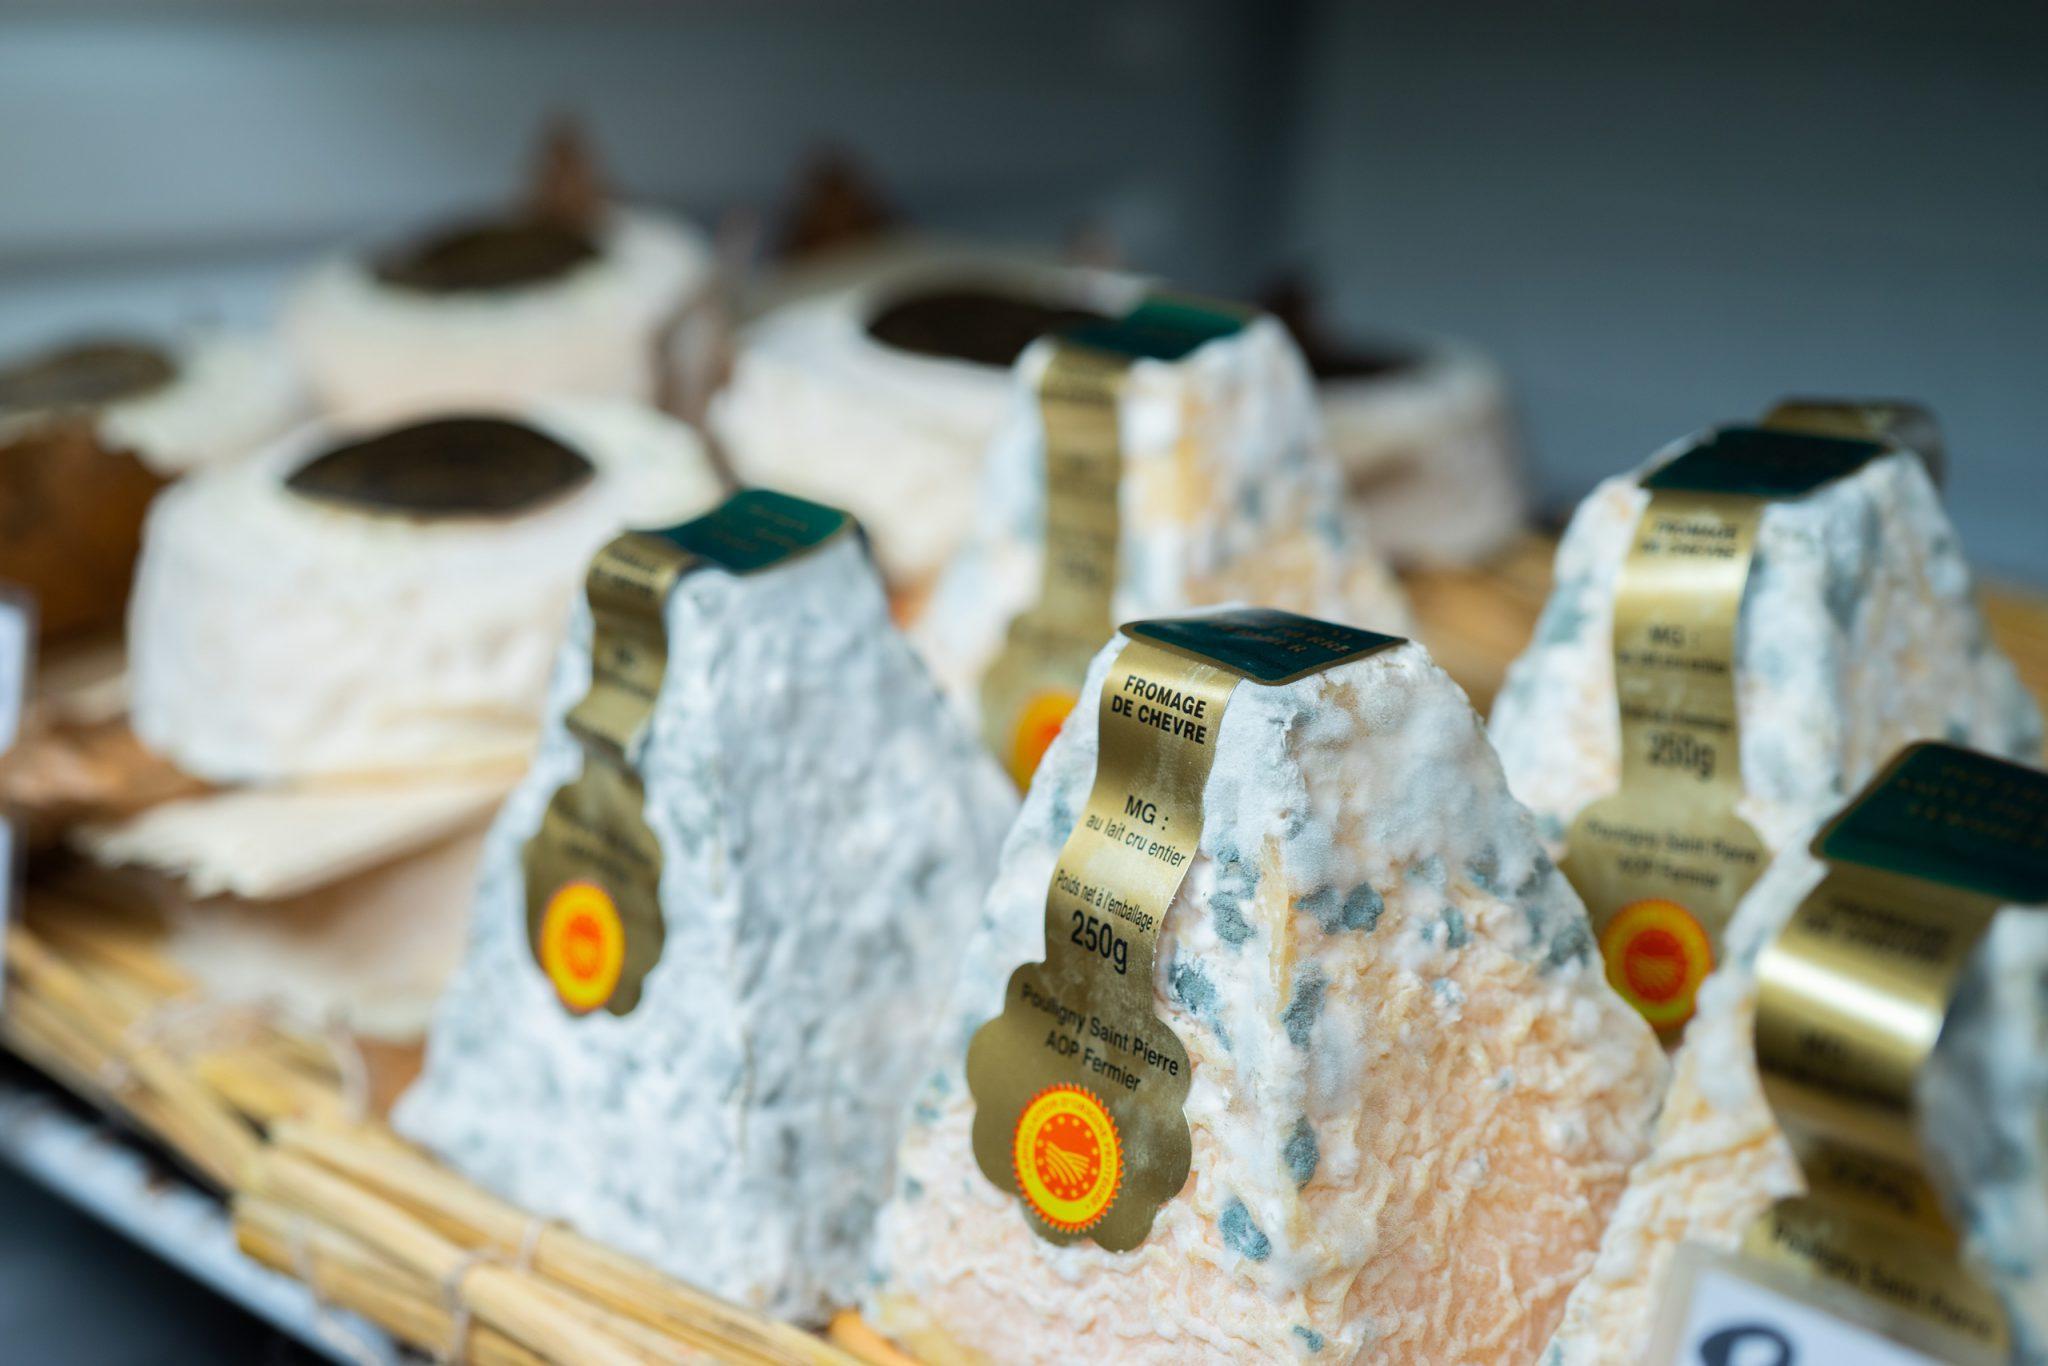 kaaskamer_amsterdam_cheese_pouligny